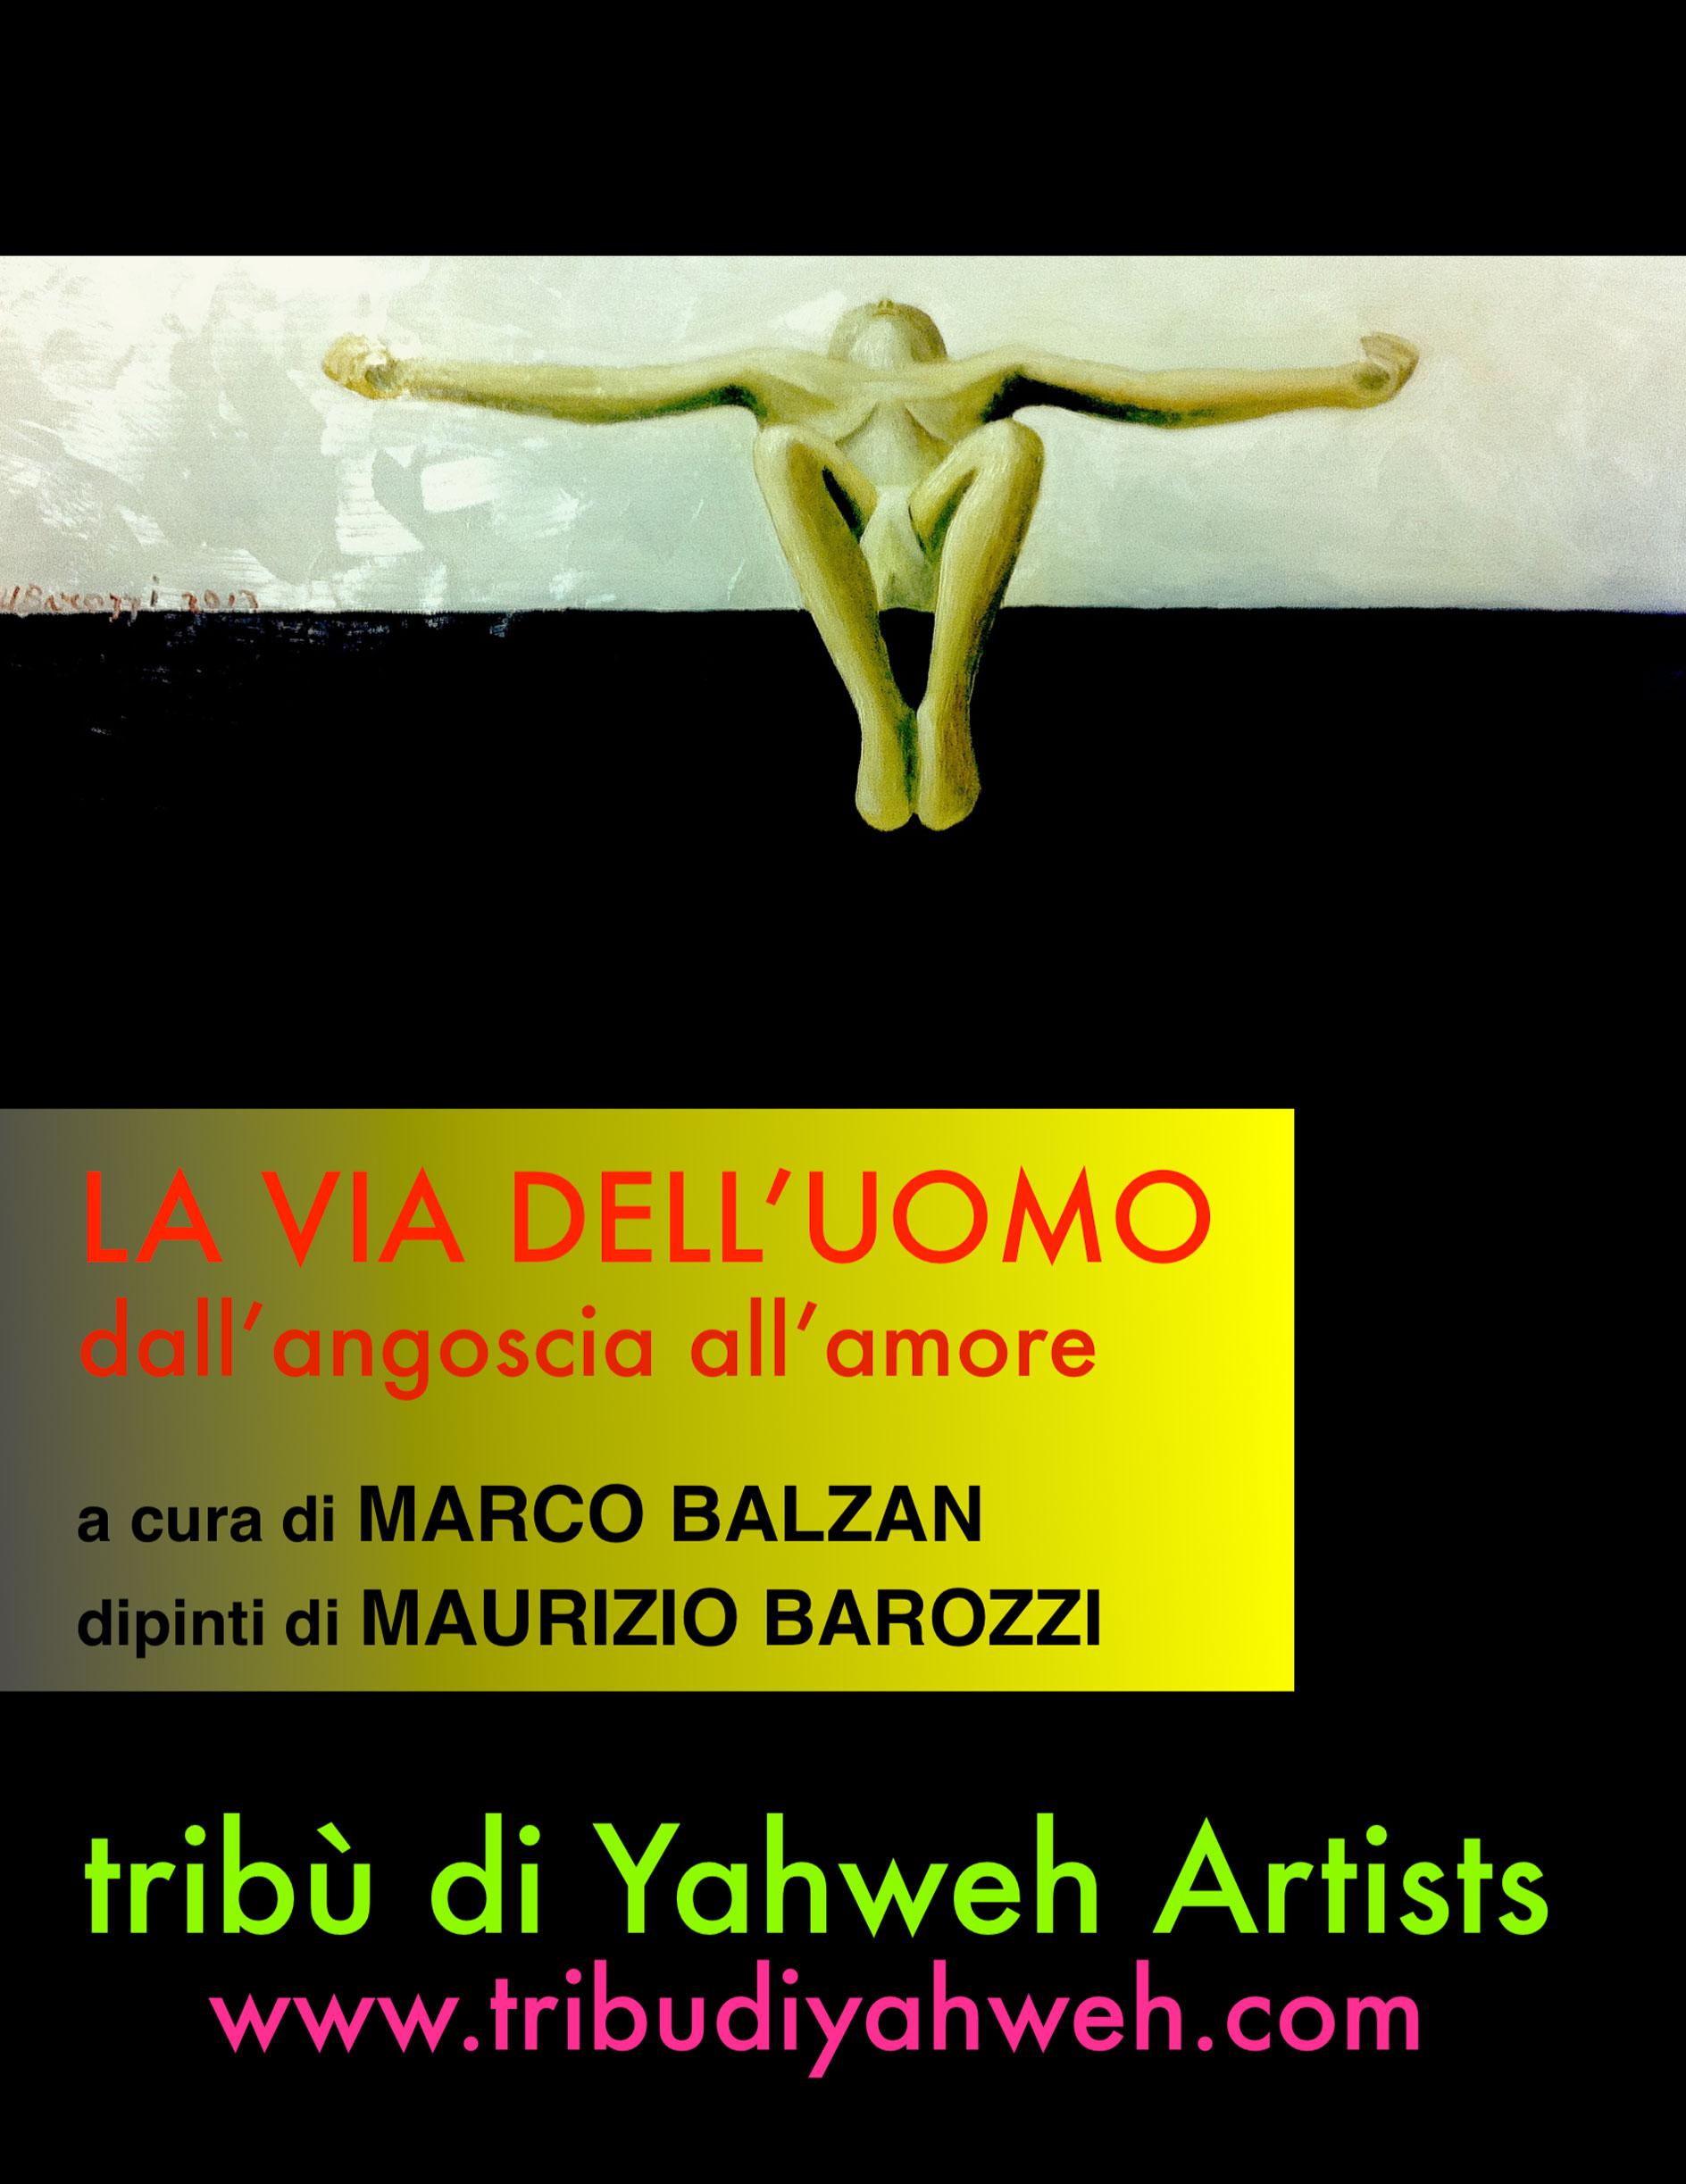 http://www.tribudiyahweh.com/wp/wp-content/uploads/2019/03/la-via-delluomo.jpg